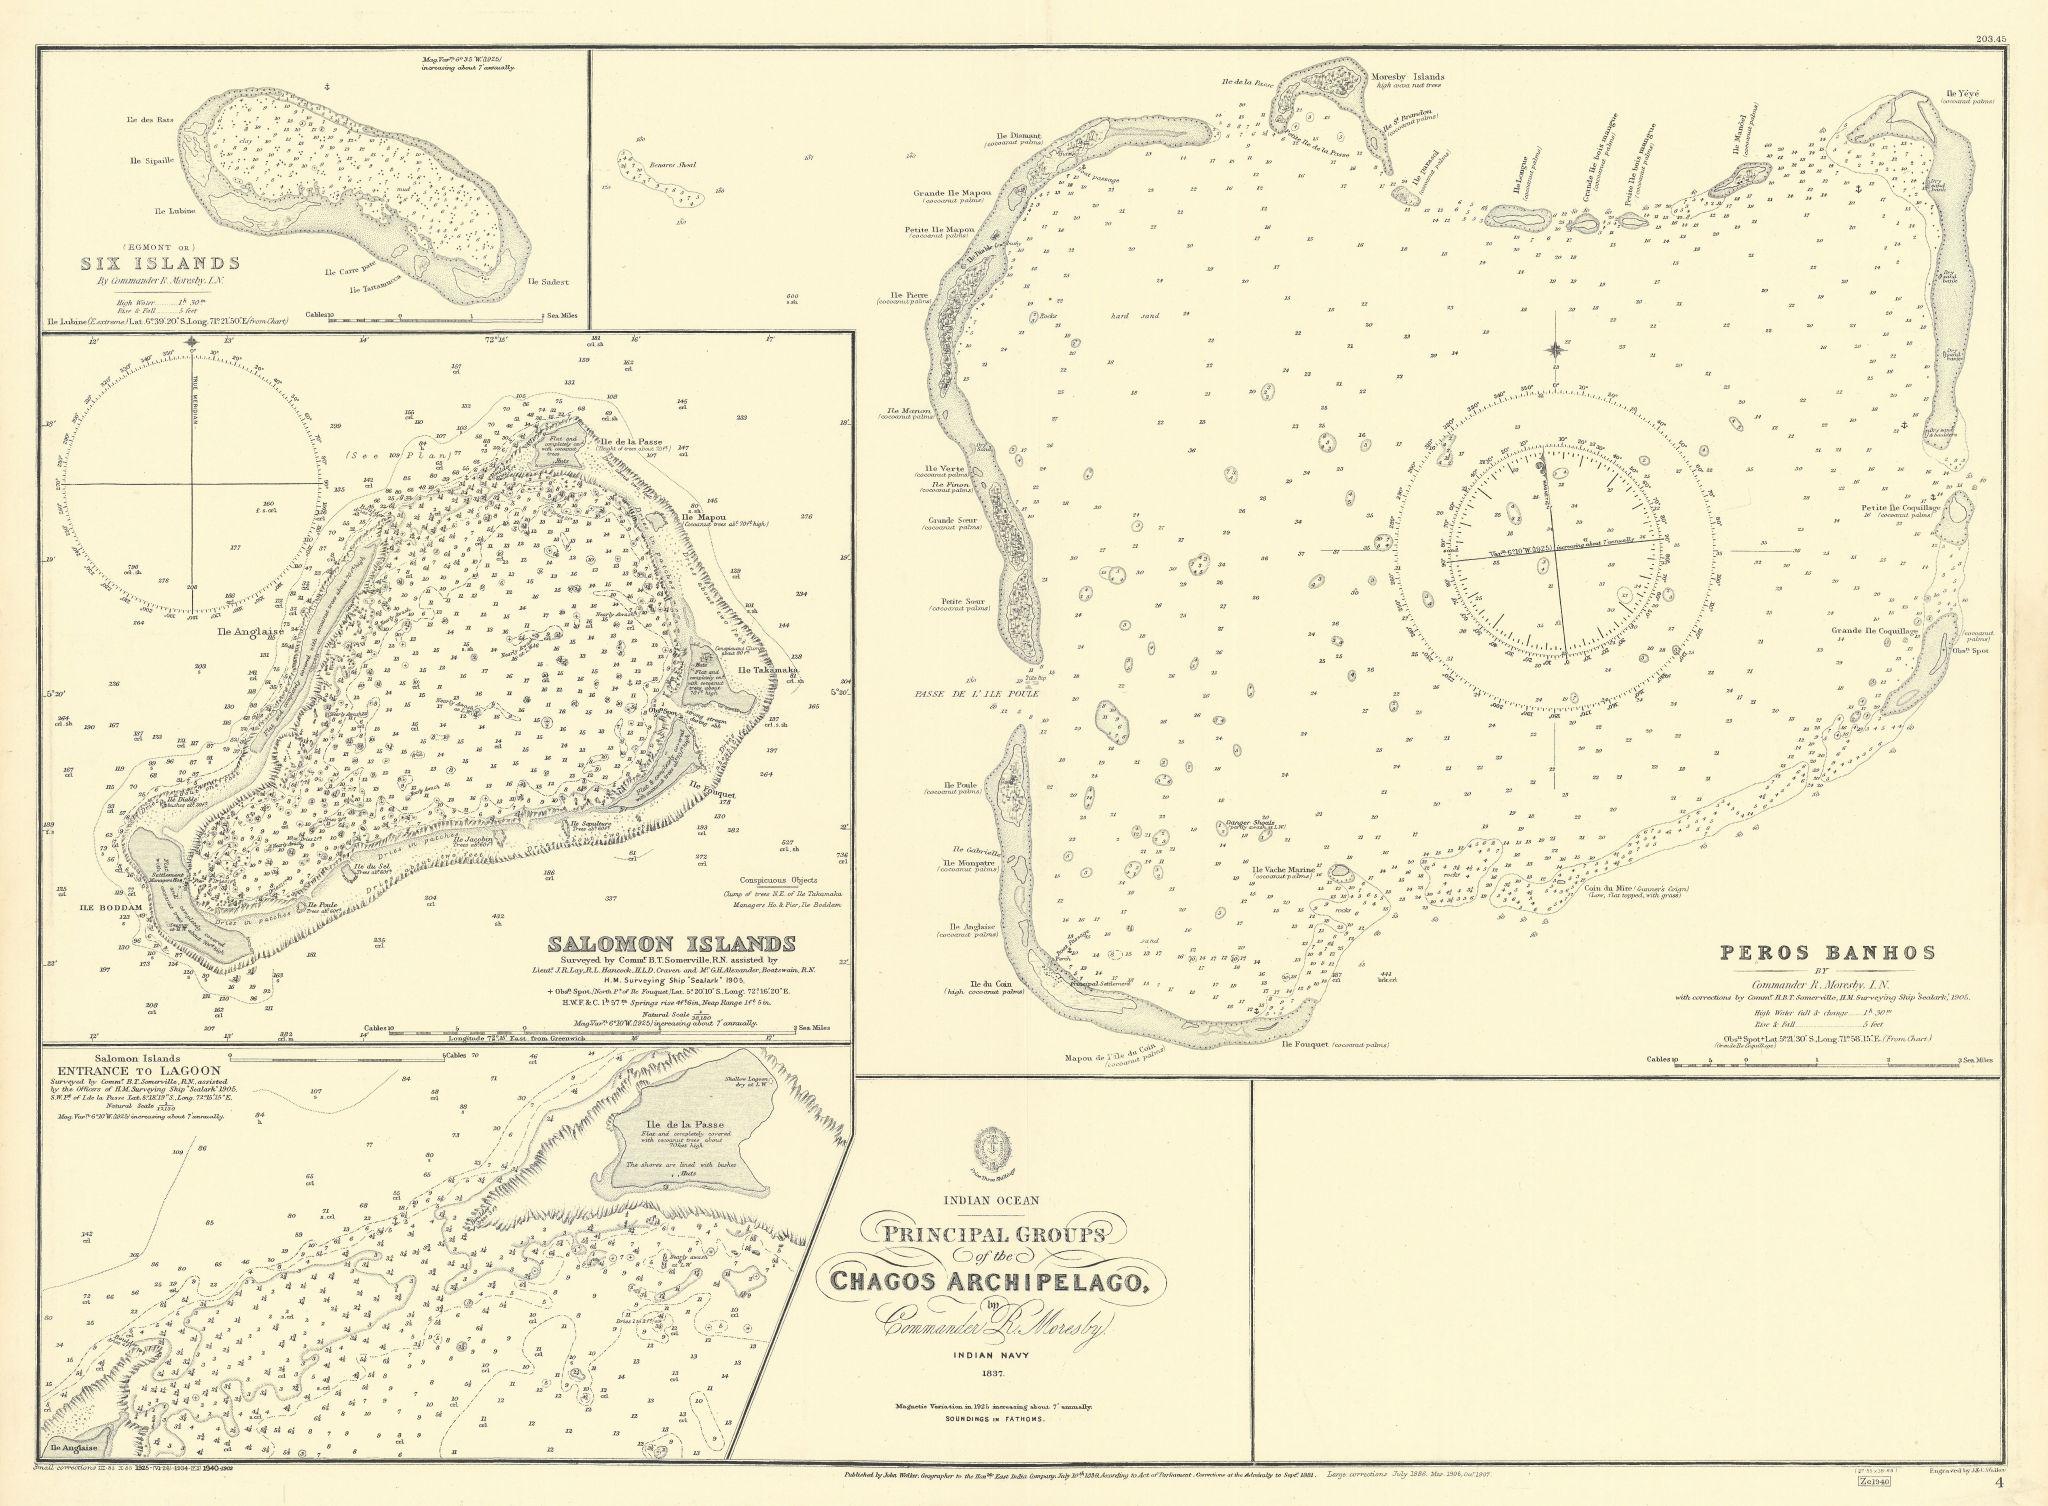 Chagos Islands Peros Banhos Egmont Salomon EAST INDIA CO. chart 1839 (1940) map